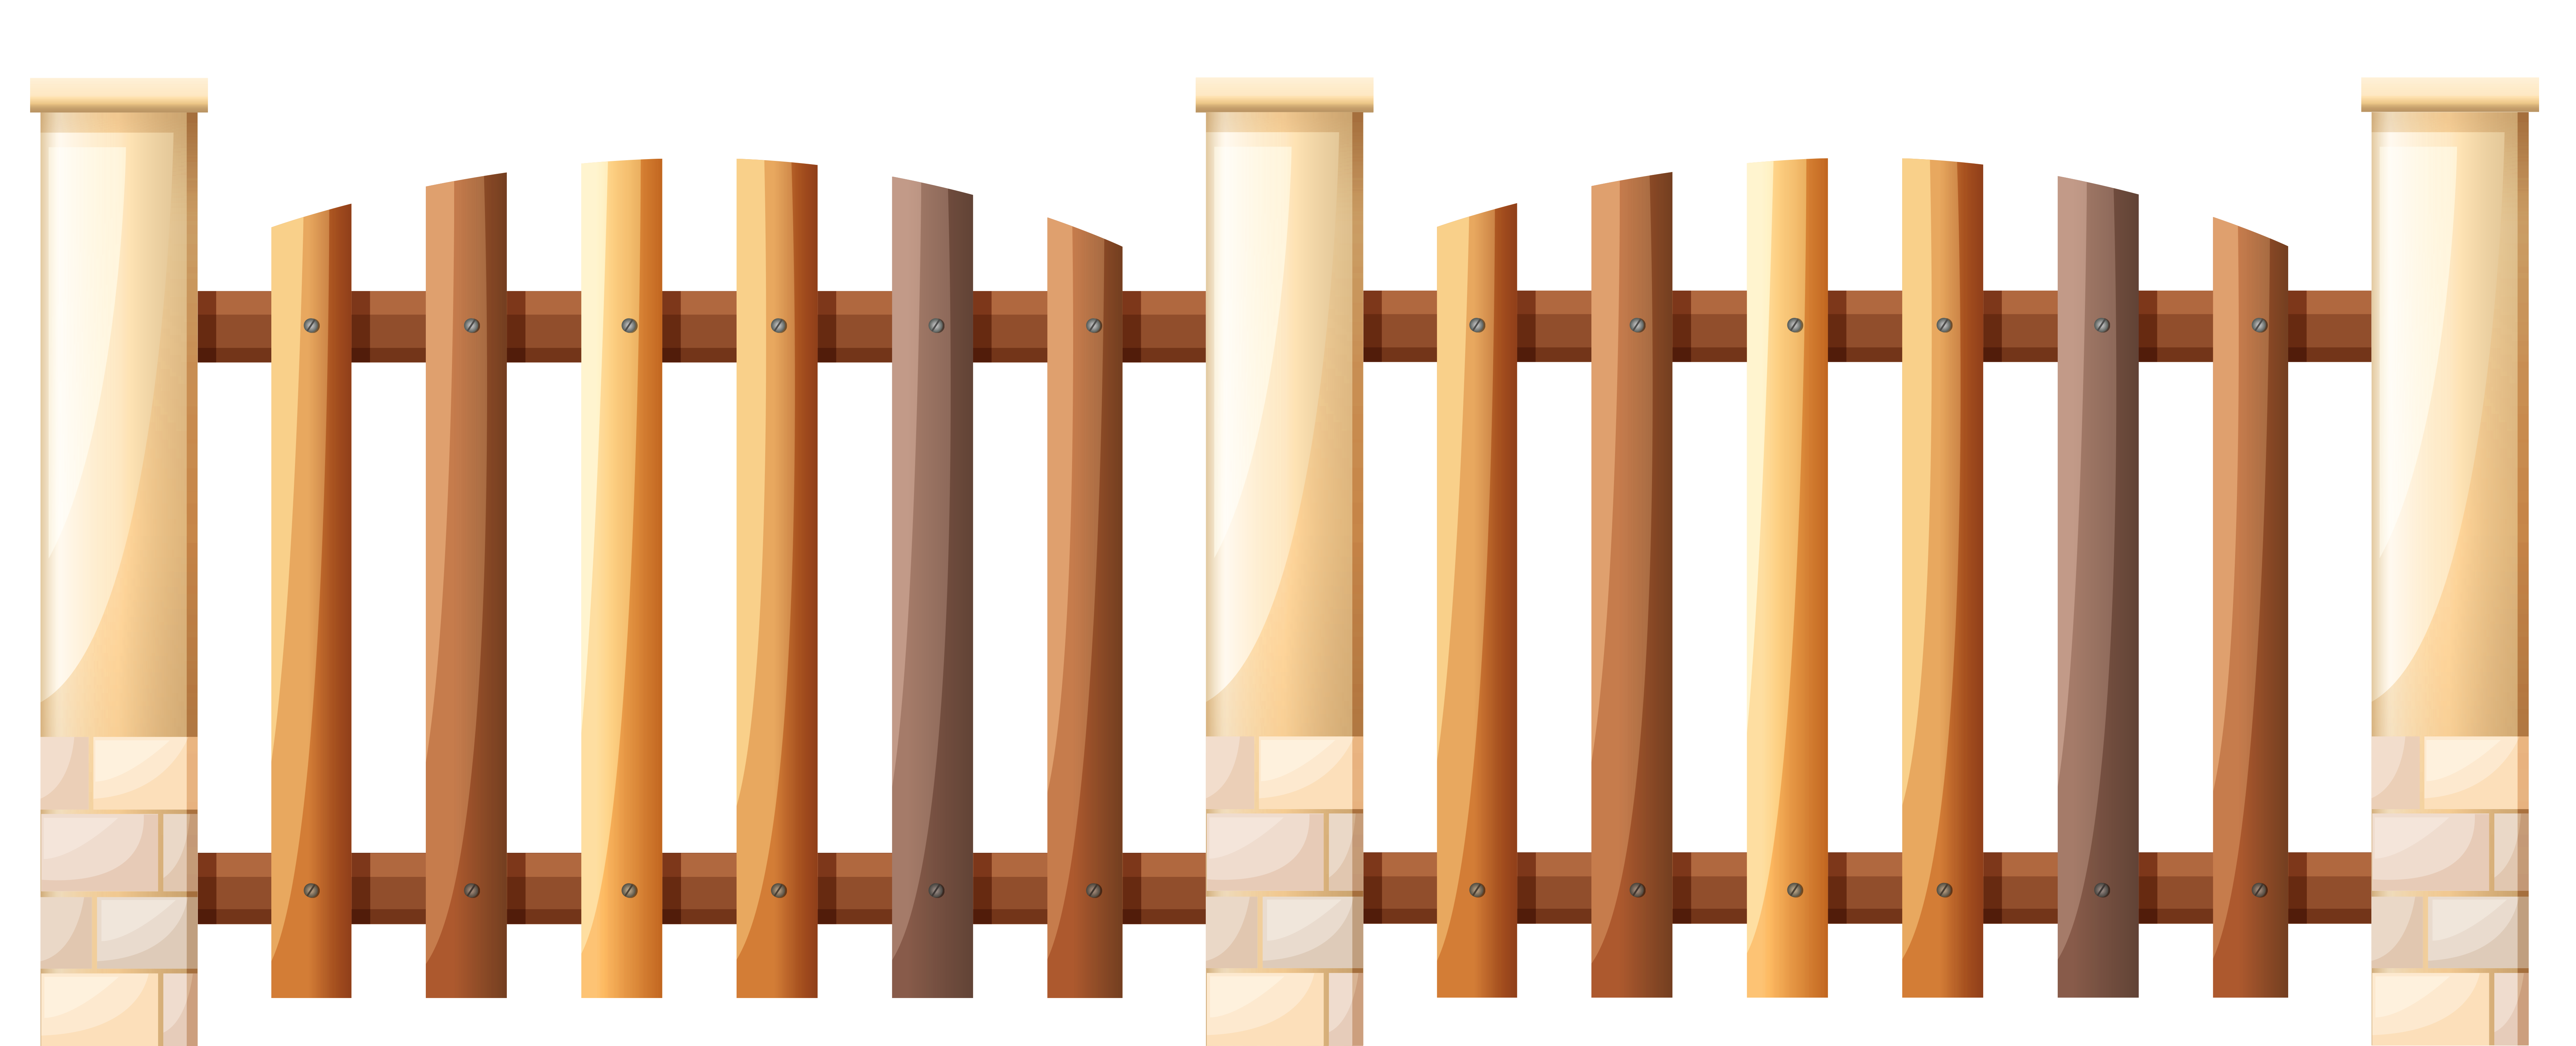 Fence Gate Clip art.